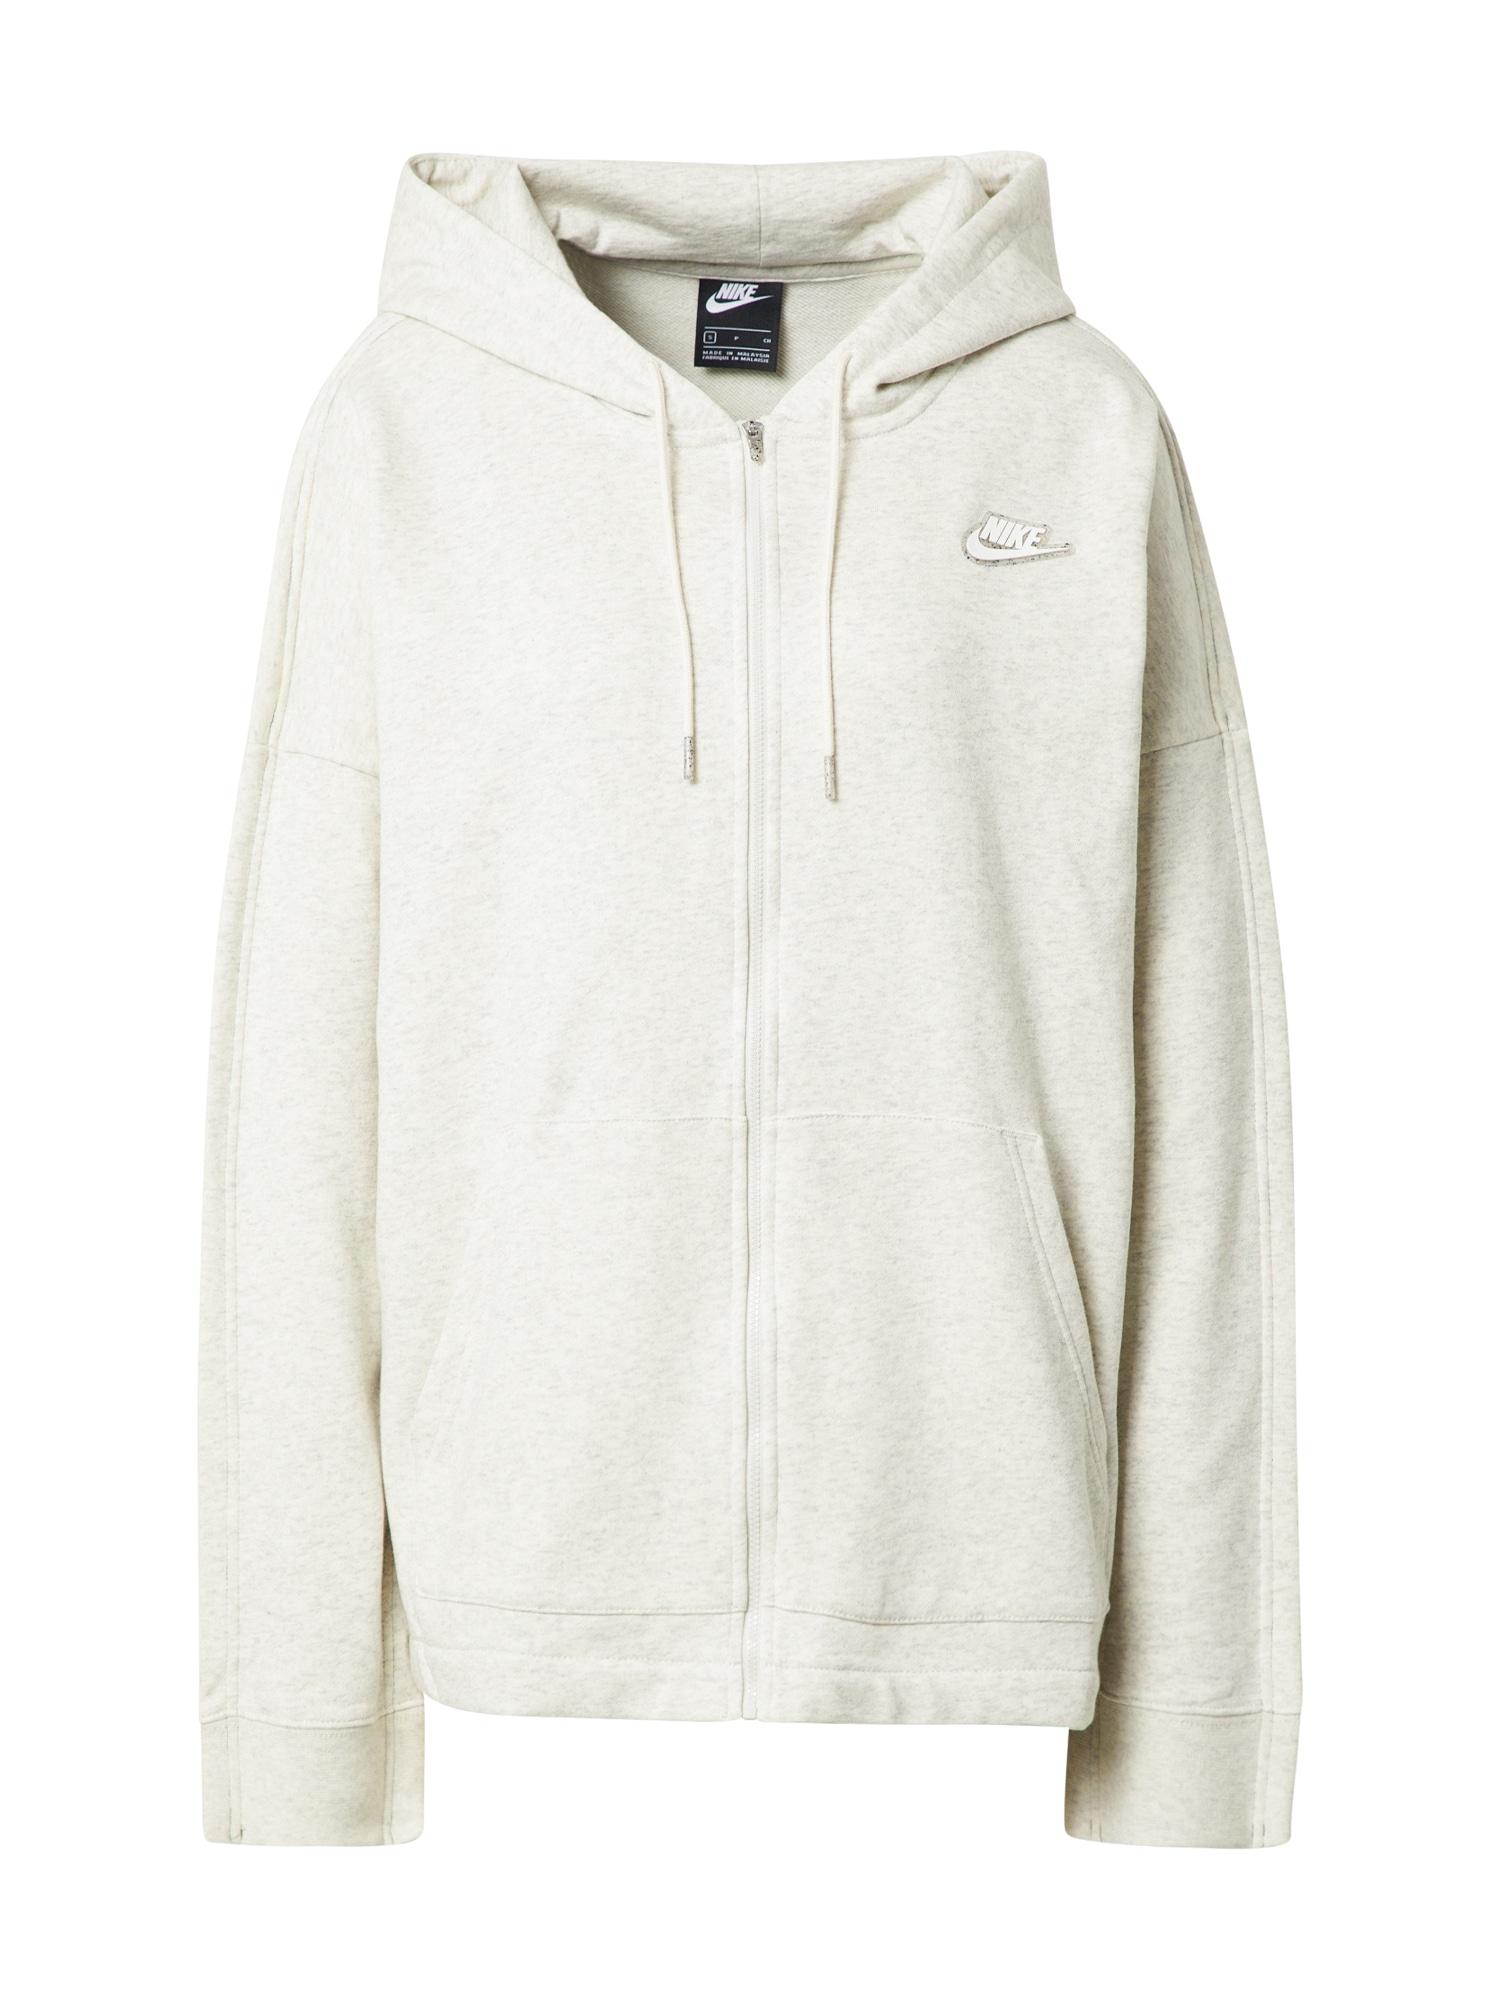 Nike Sportswear Džemperis margai balta